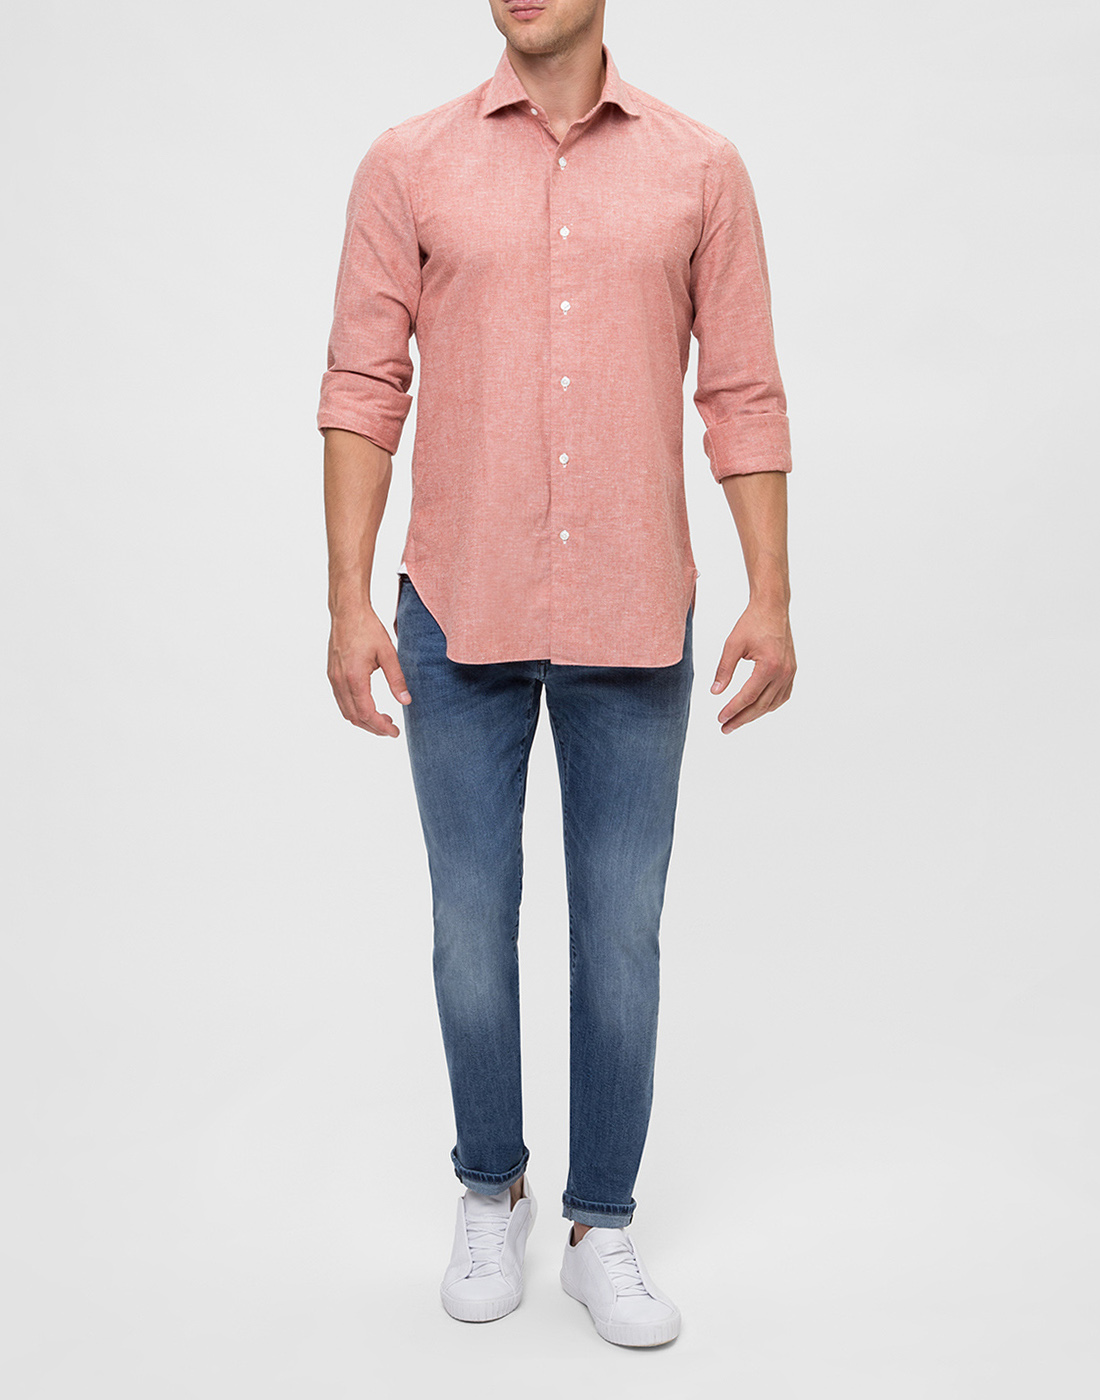 Мужская оранжевая рубашка Barba S556603U-6